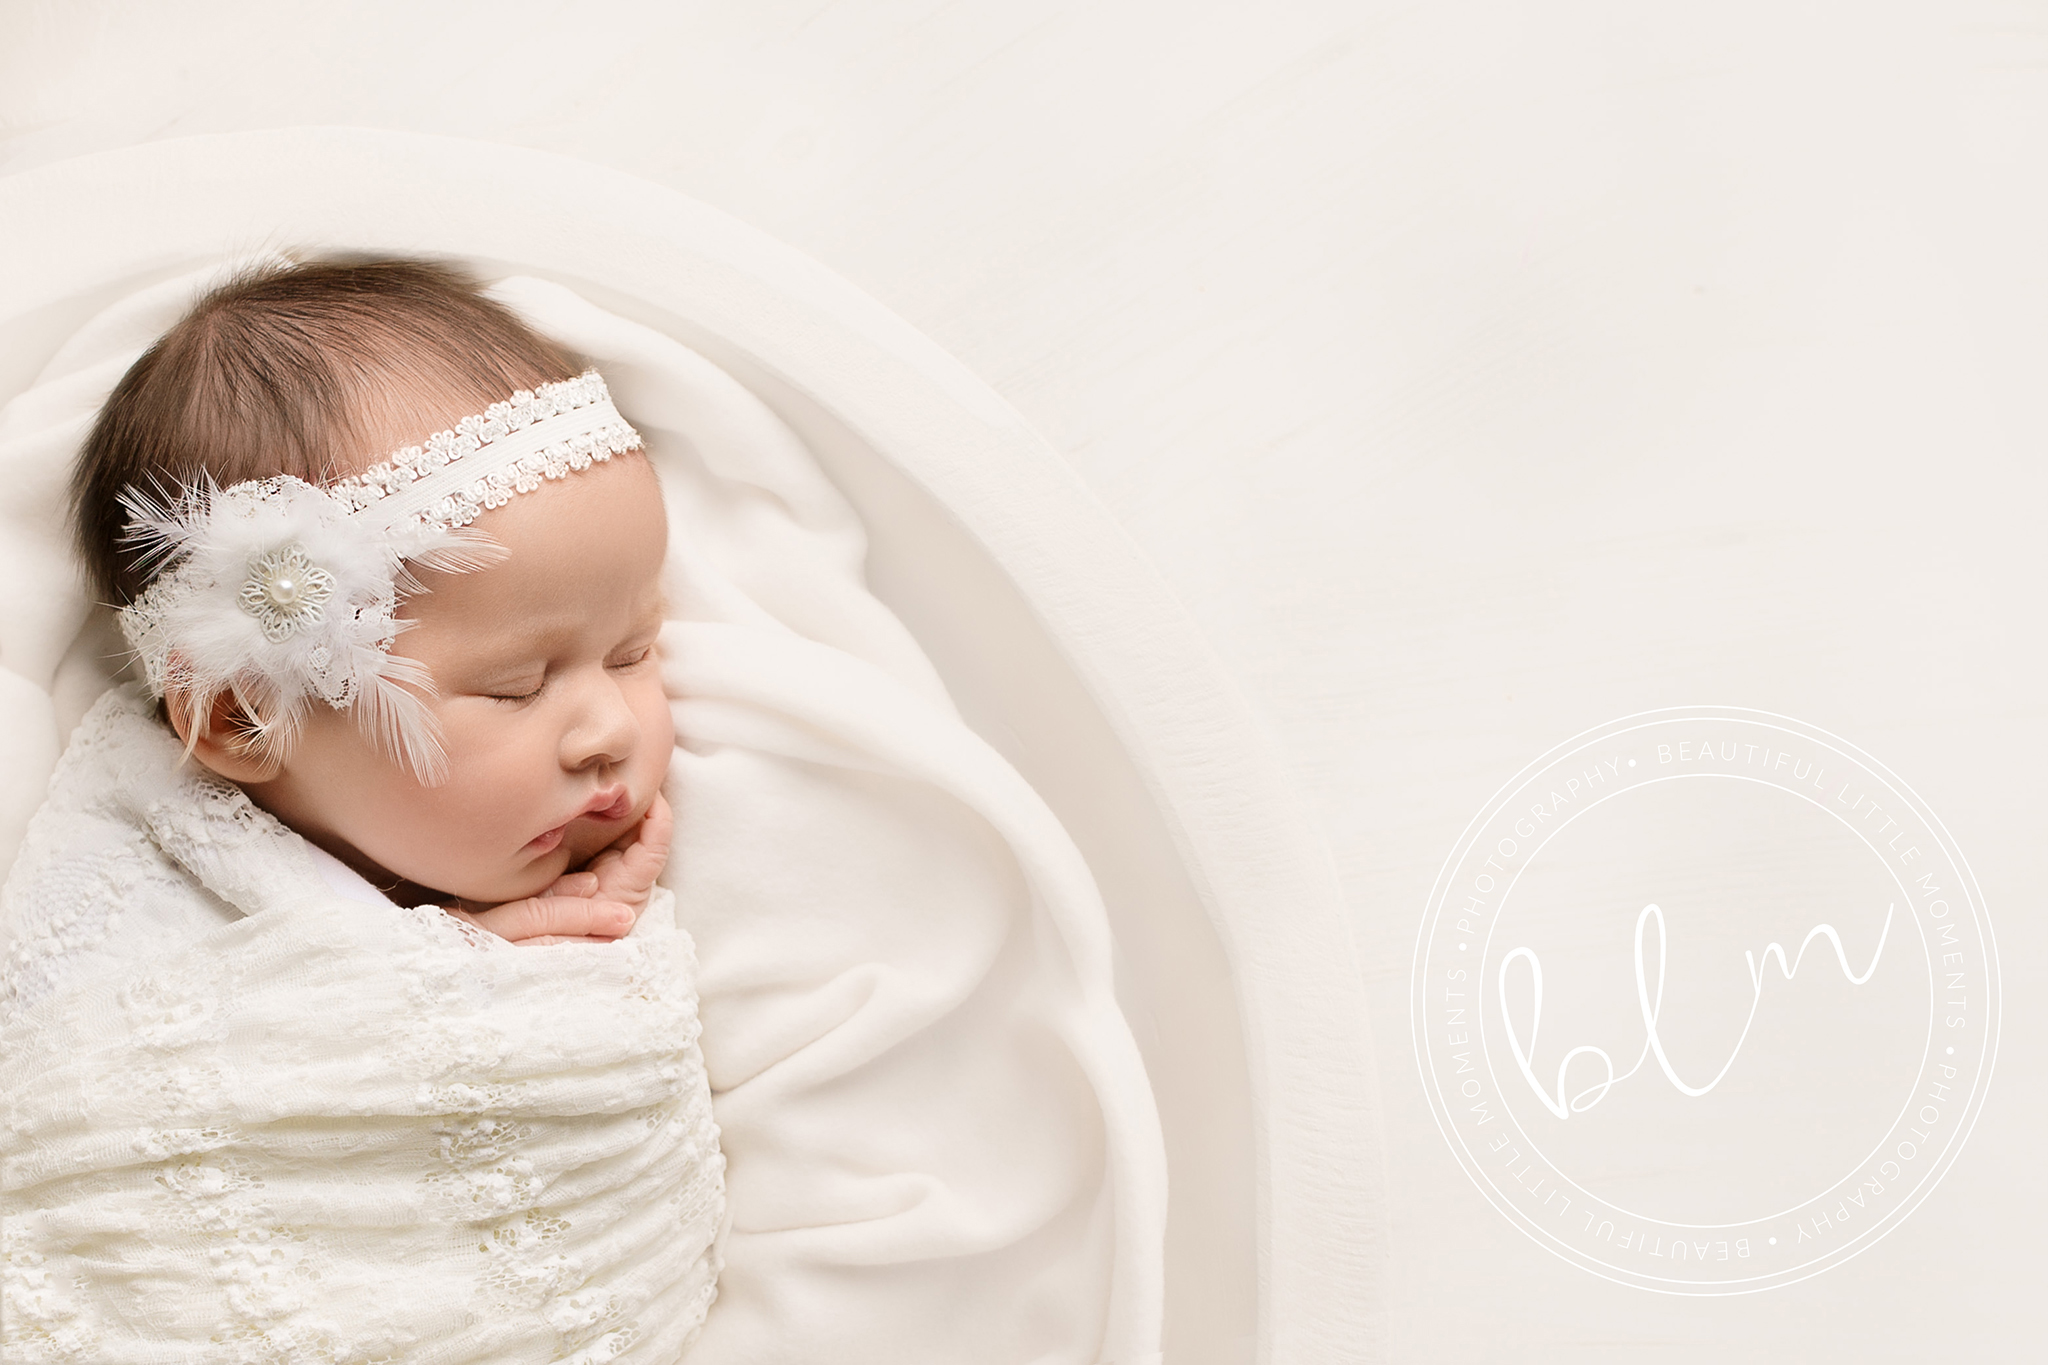 newborn baby girl photo shoot baby wrapped in white